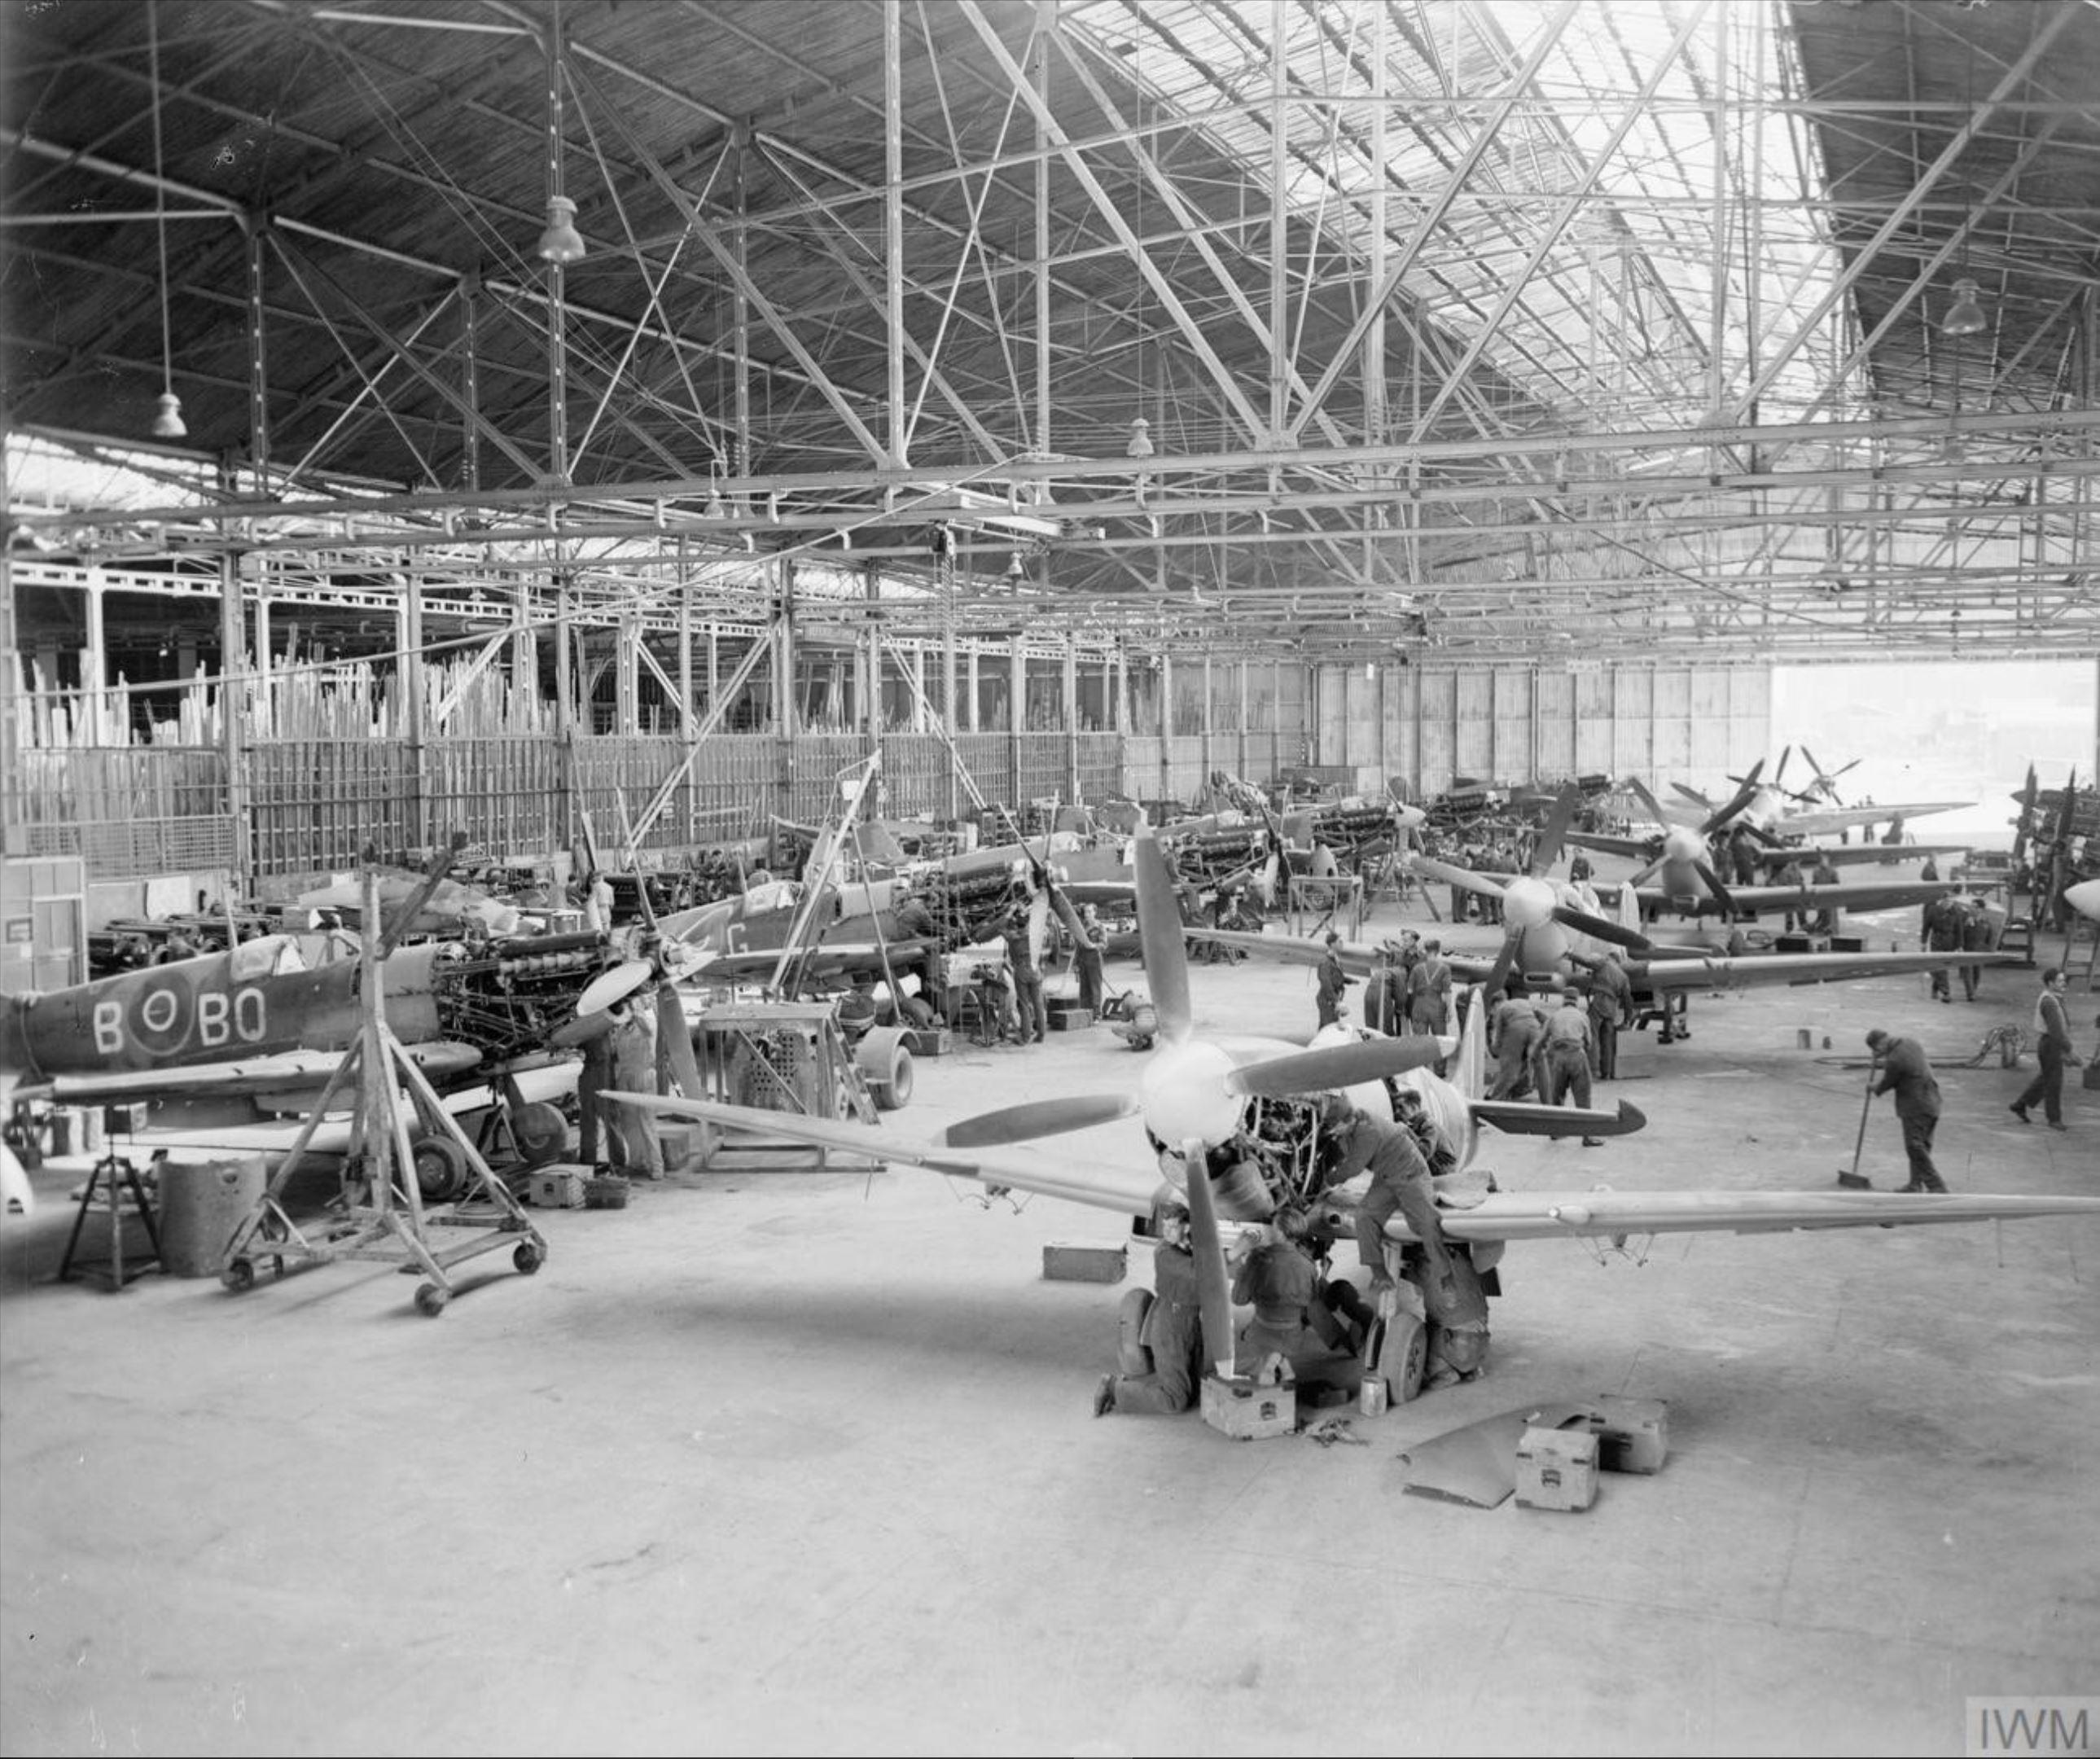 MU Spitfires at RAF 156 Maintenance Unit Blida Algeria 1944 IWM CNA3305